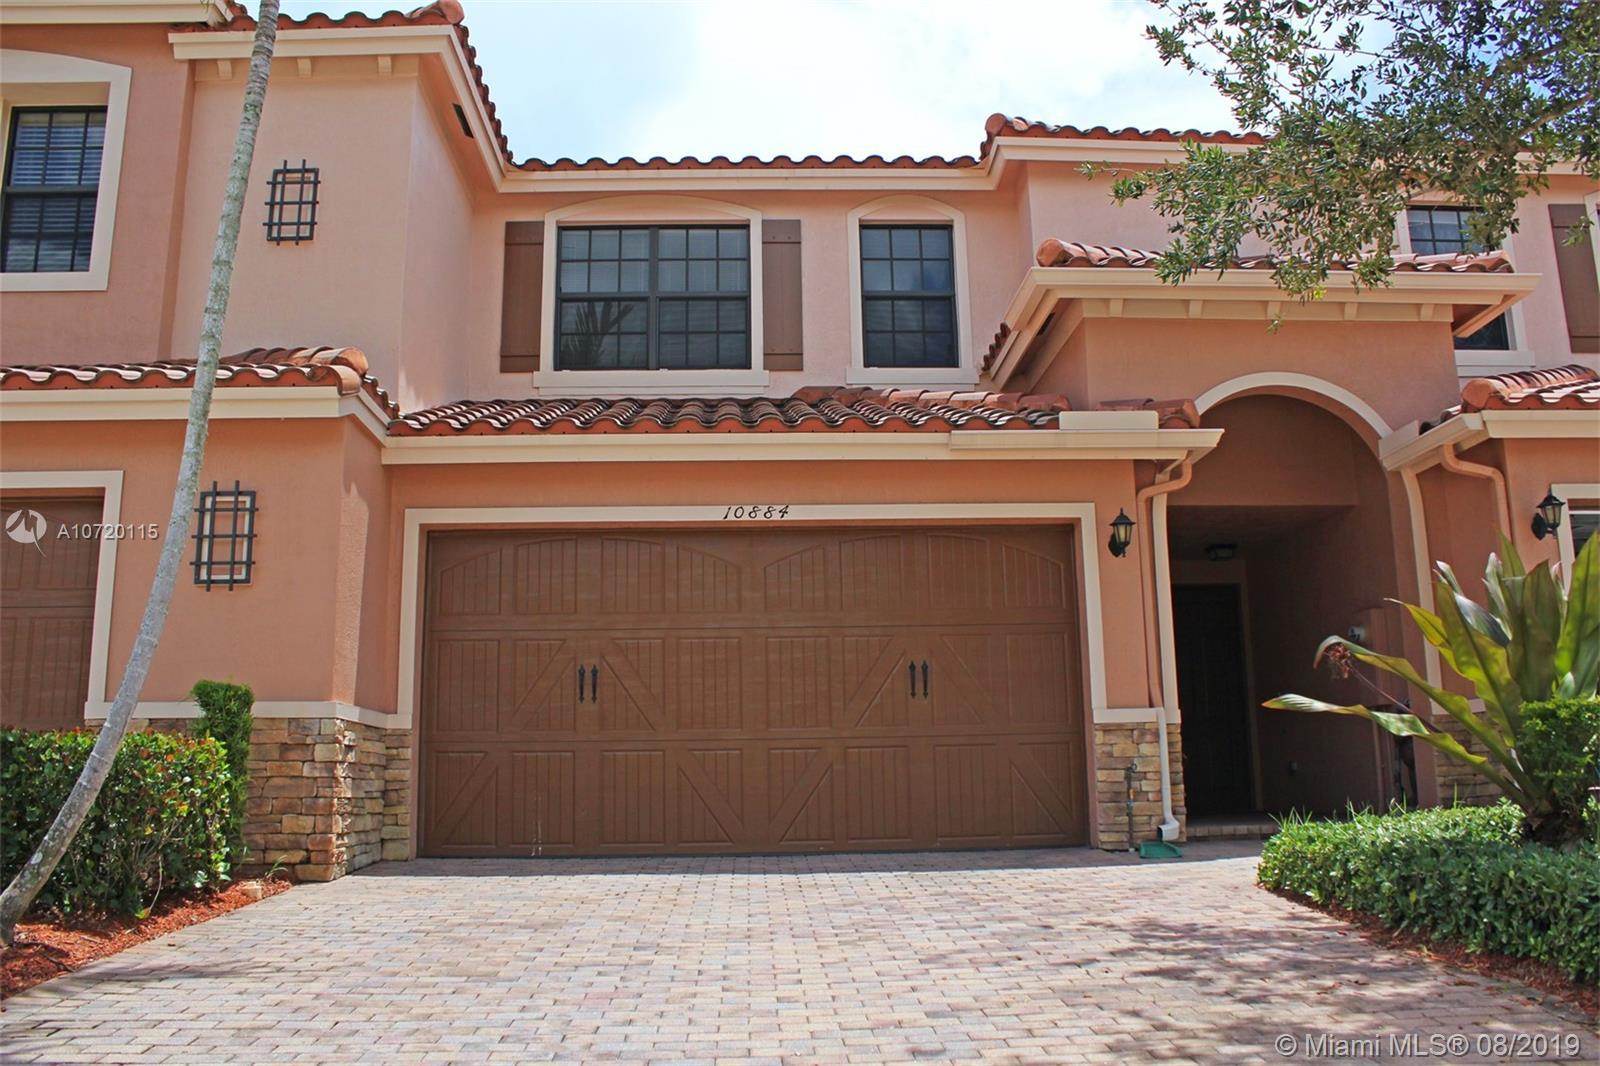 Property for sale at 10884 NW 72nd Pl # 10884, Parkland FL 33076 Unit 10884, Parkland,  Florida 33076